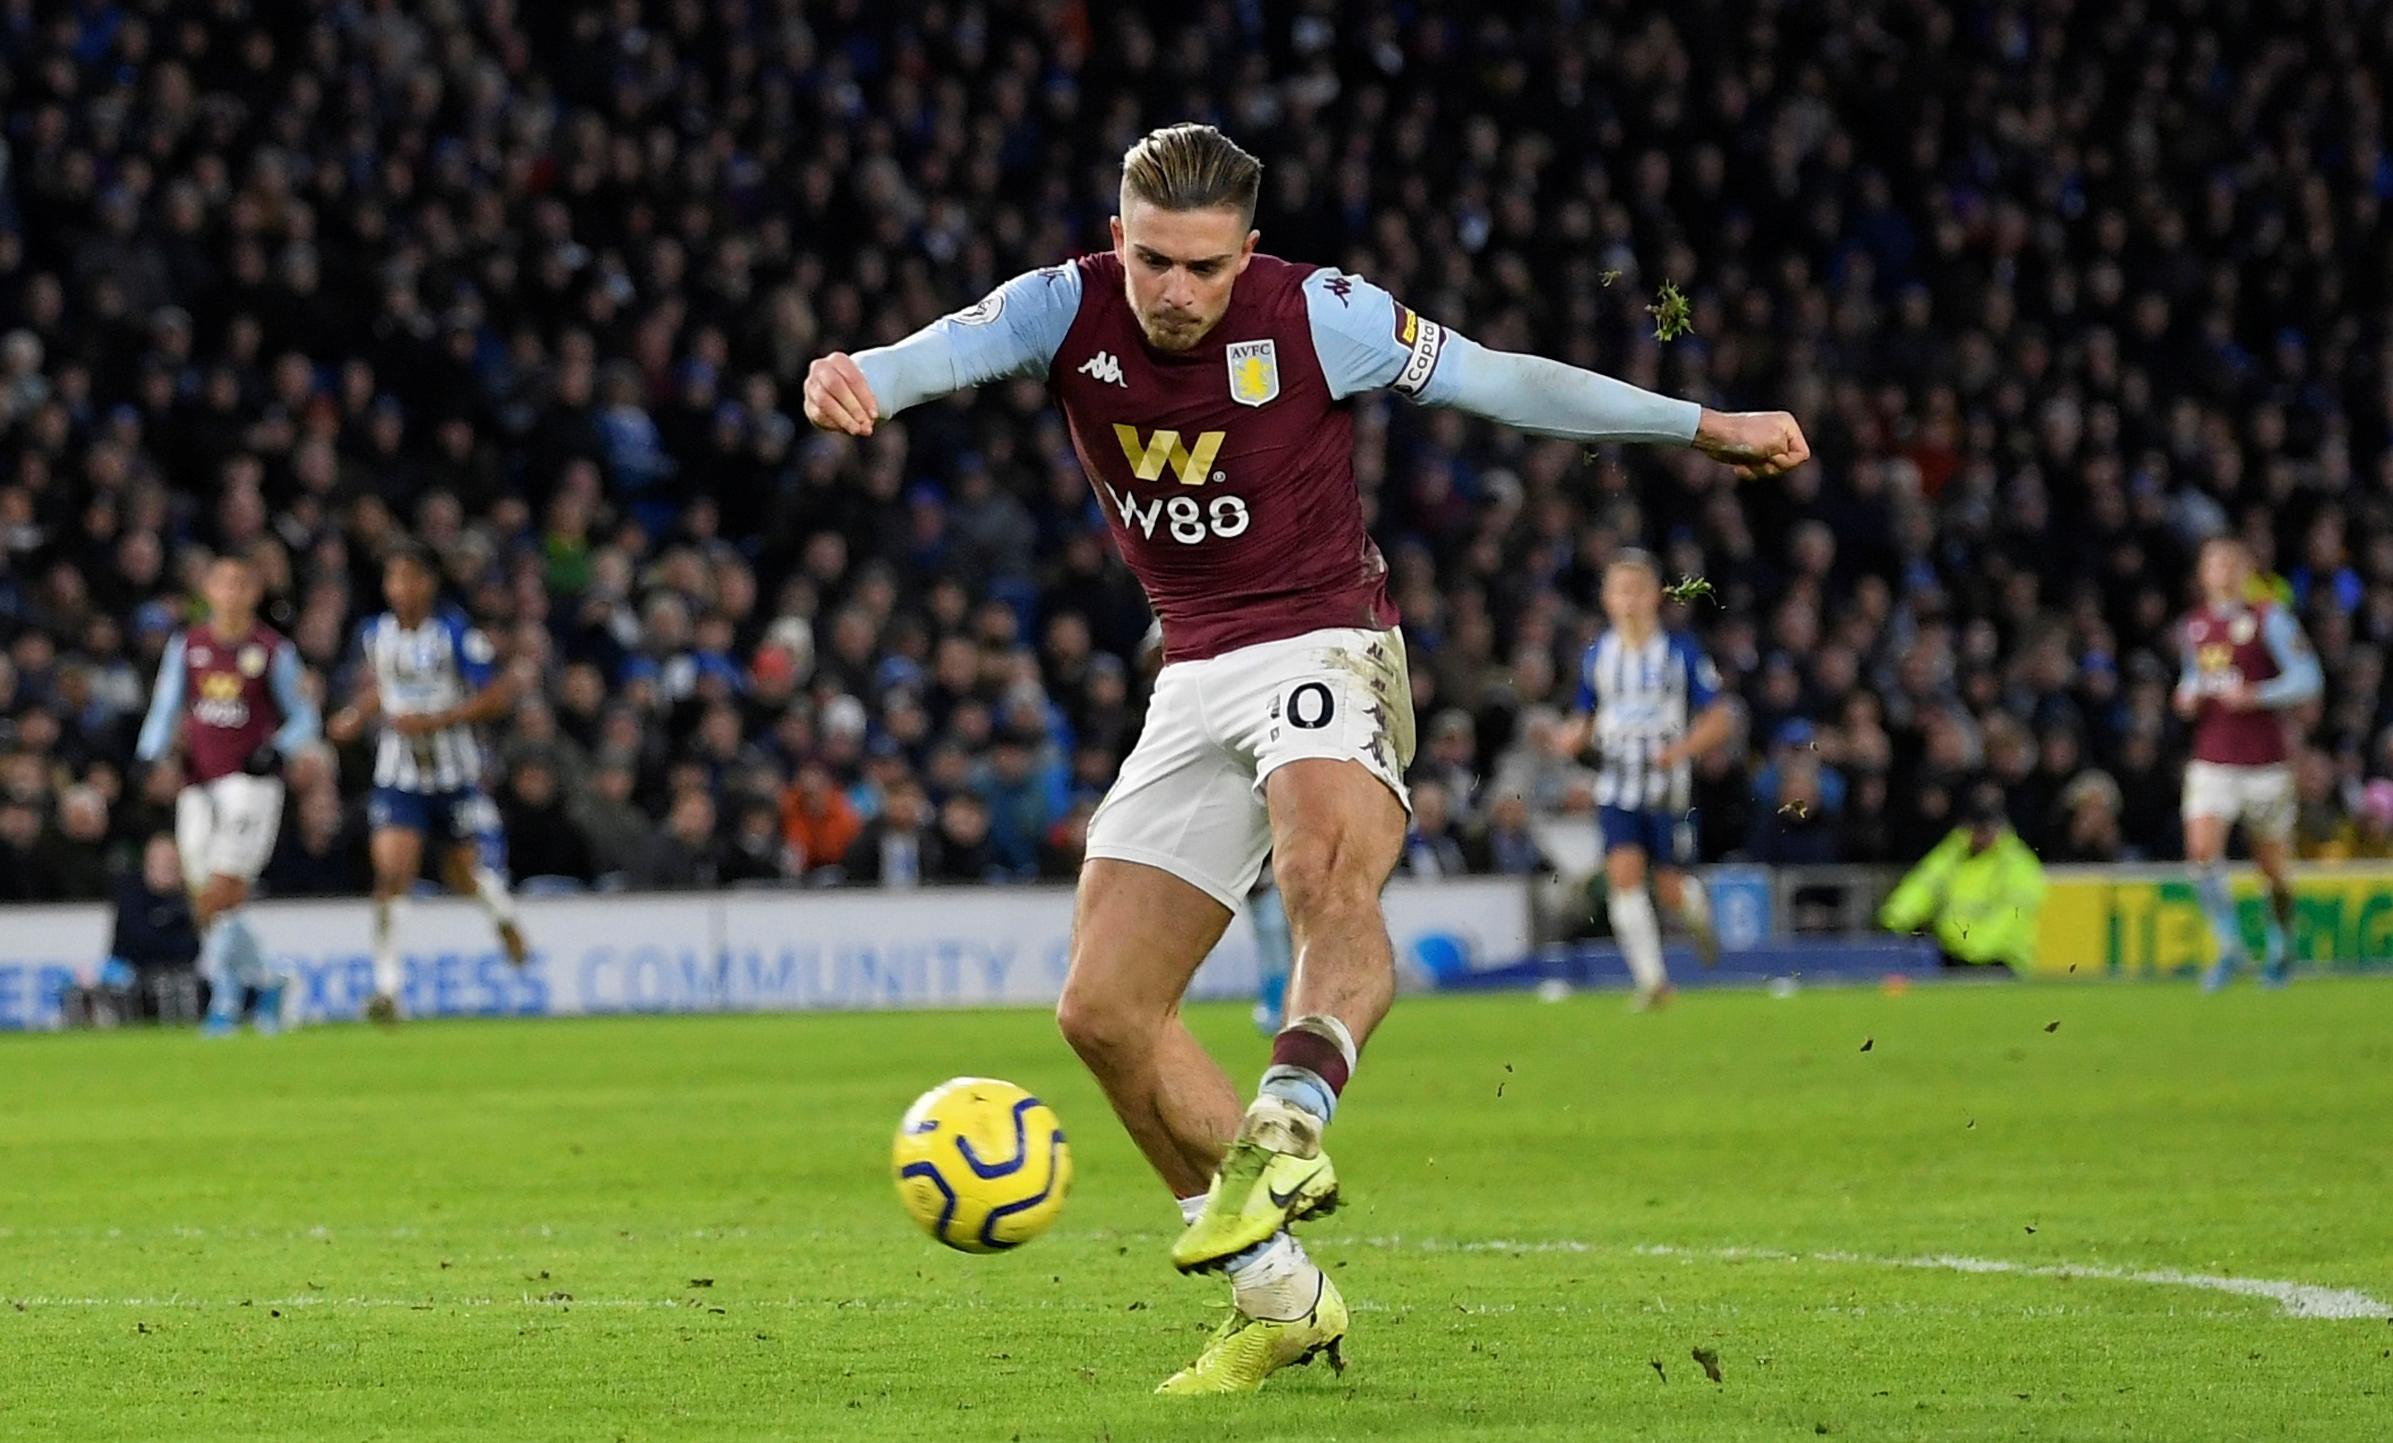 FPL transfer targets: Jack Grealish